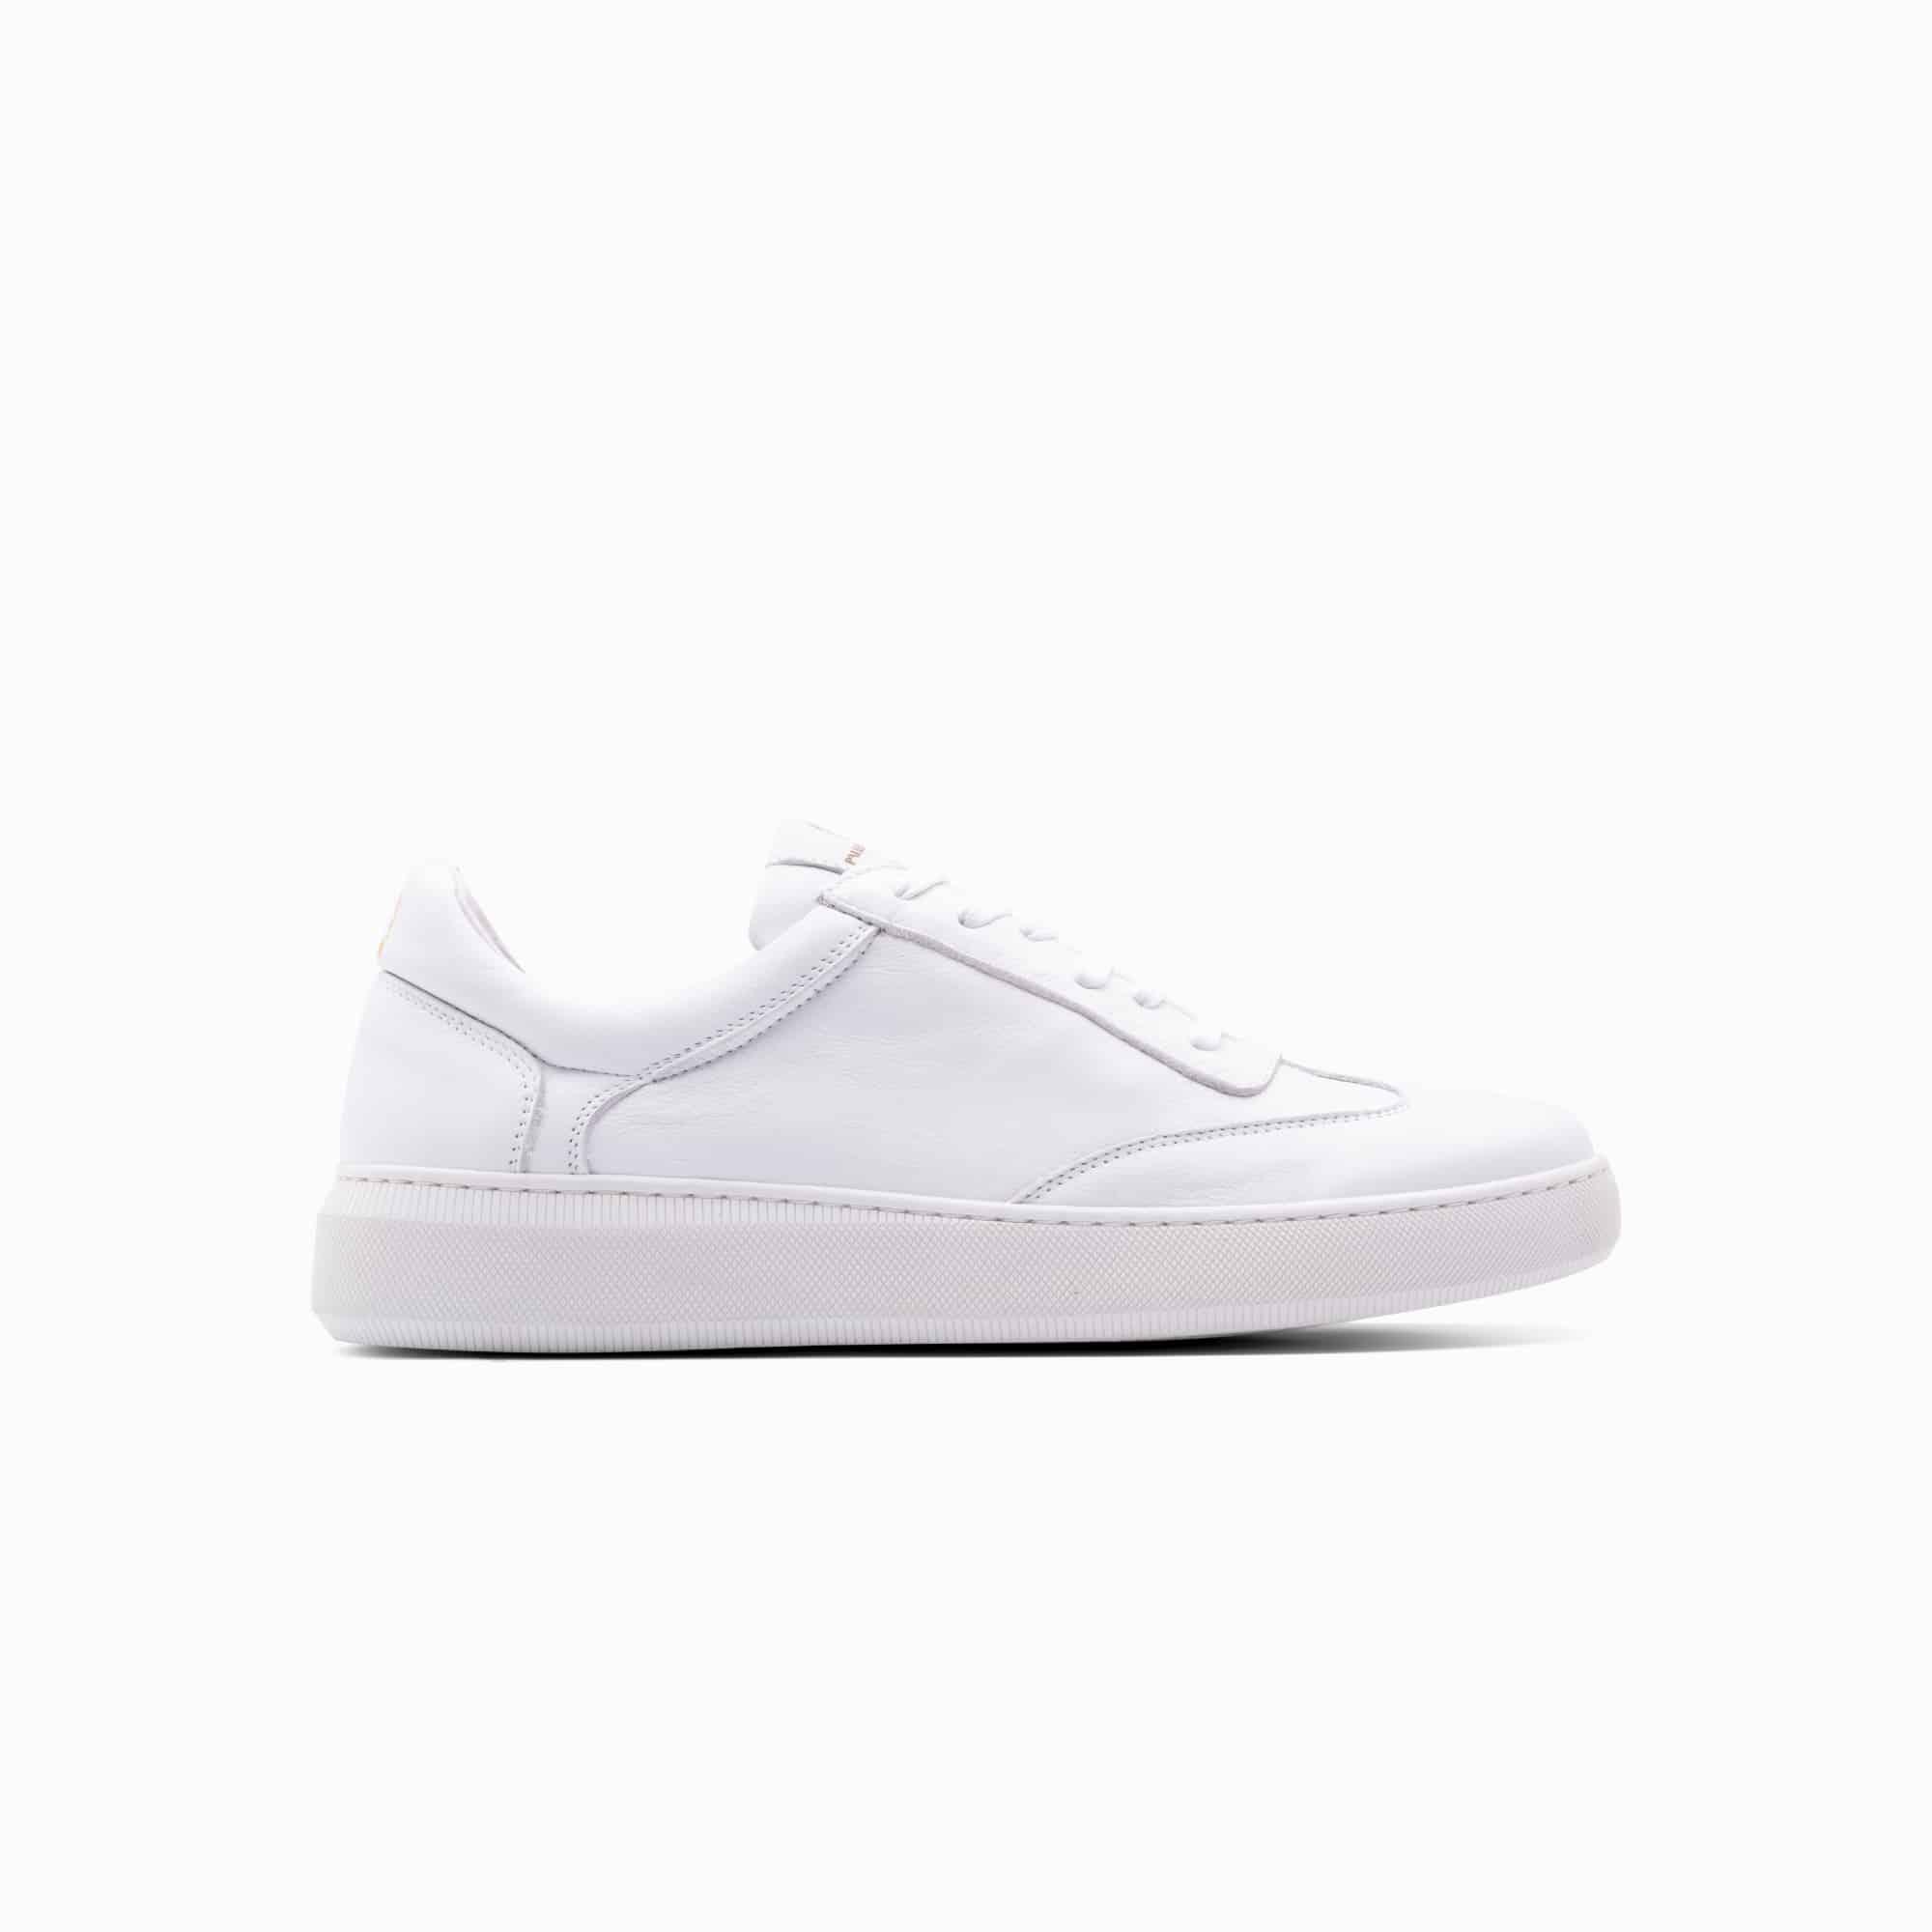 22018-white